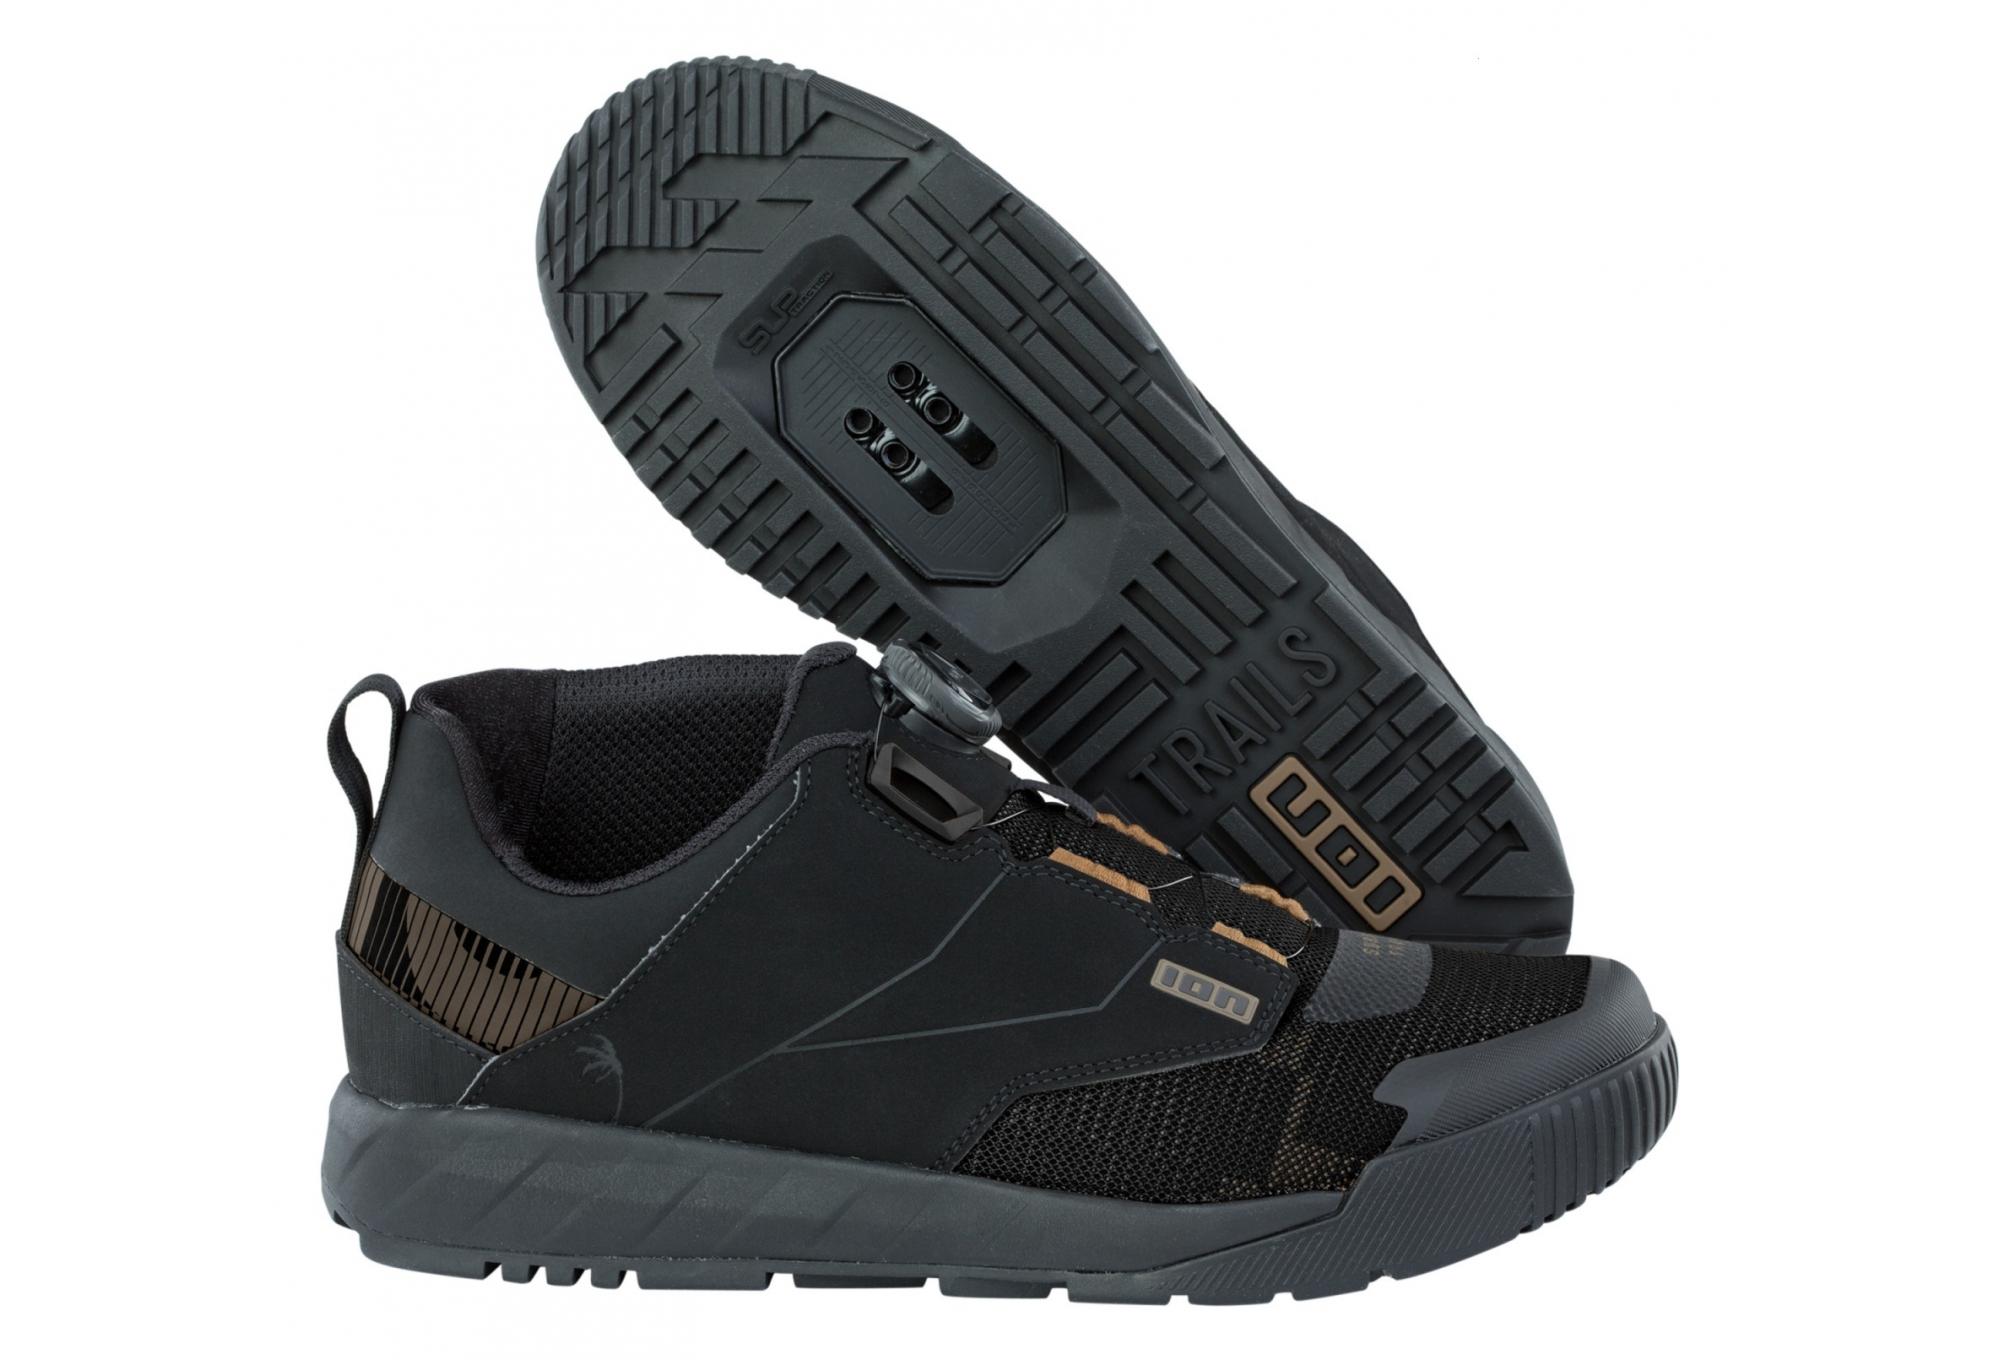 Chaussures VTT ION Rascal Select BOA Noir